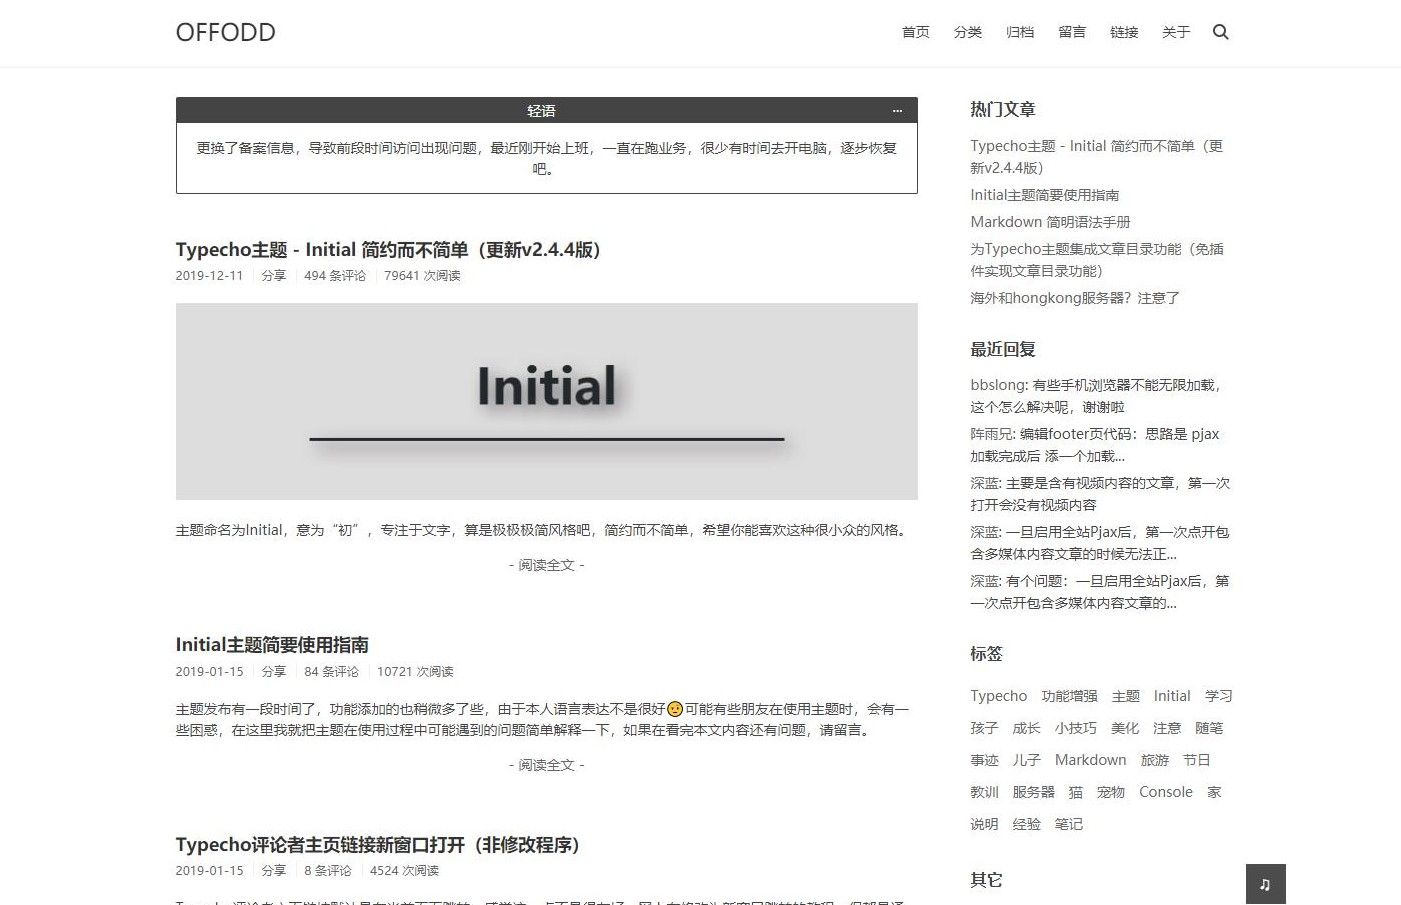 Typecho主题 - Initial 简约而不简单-晨夕阁